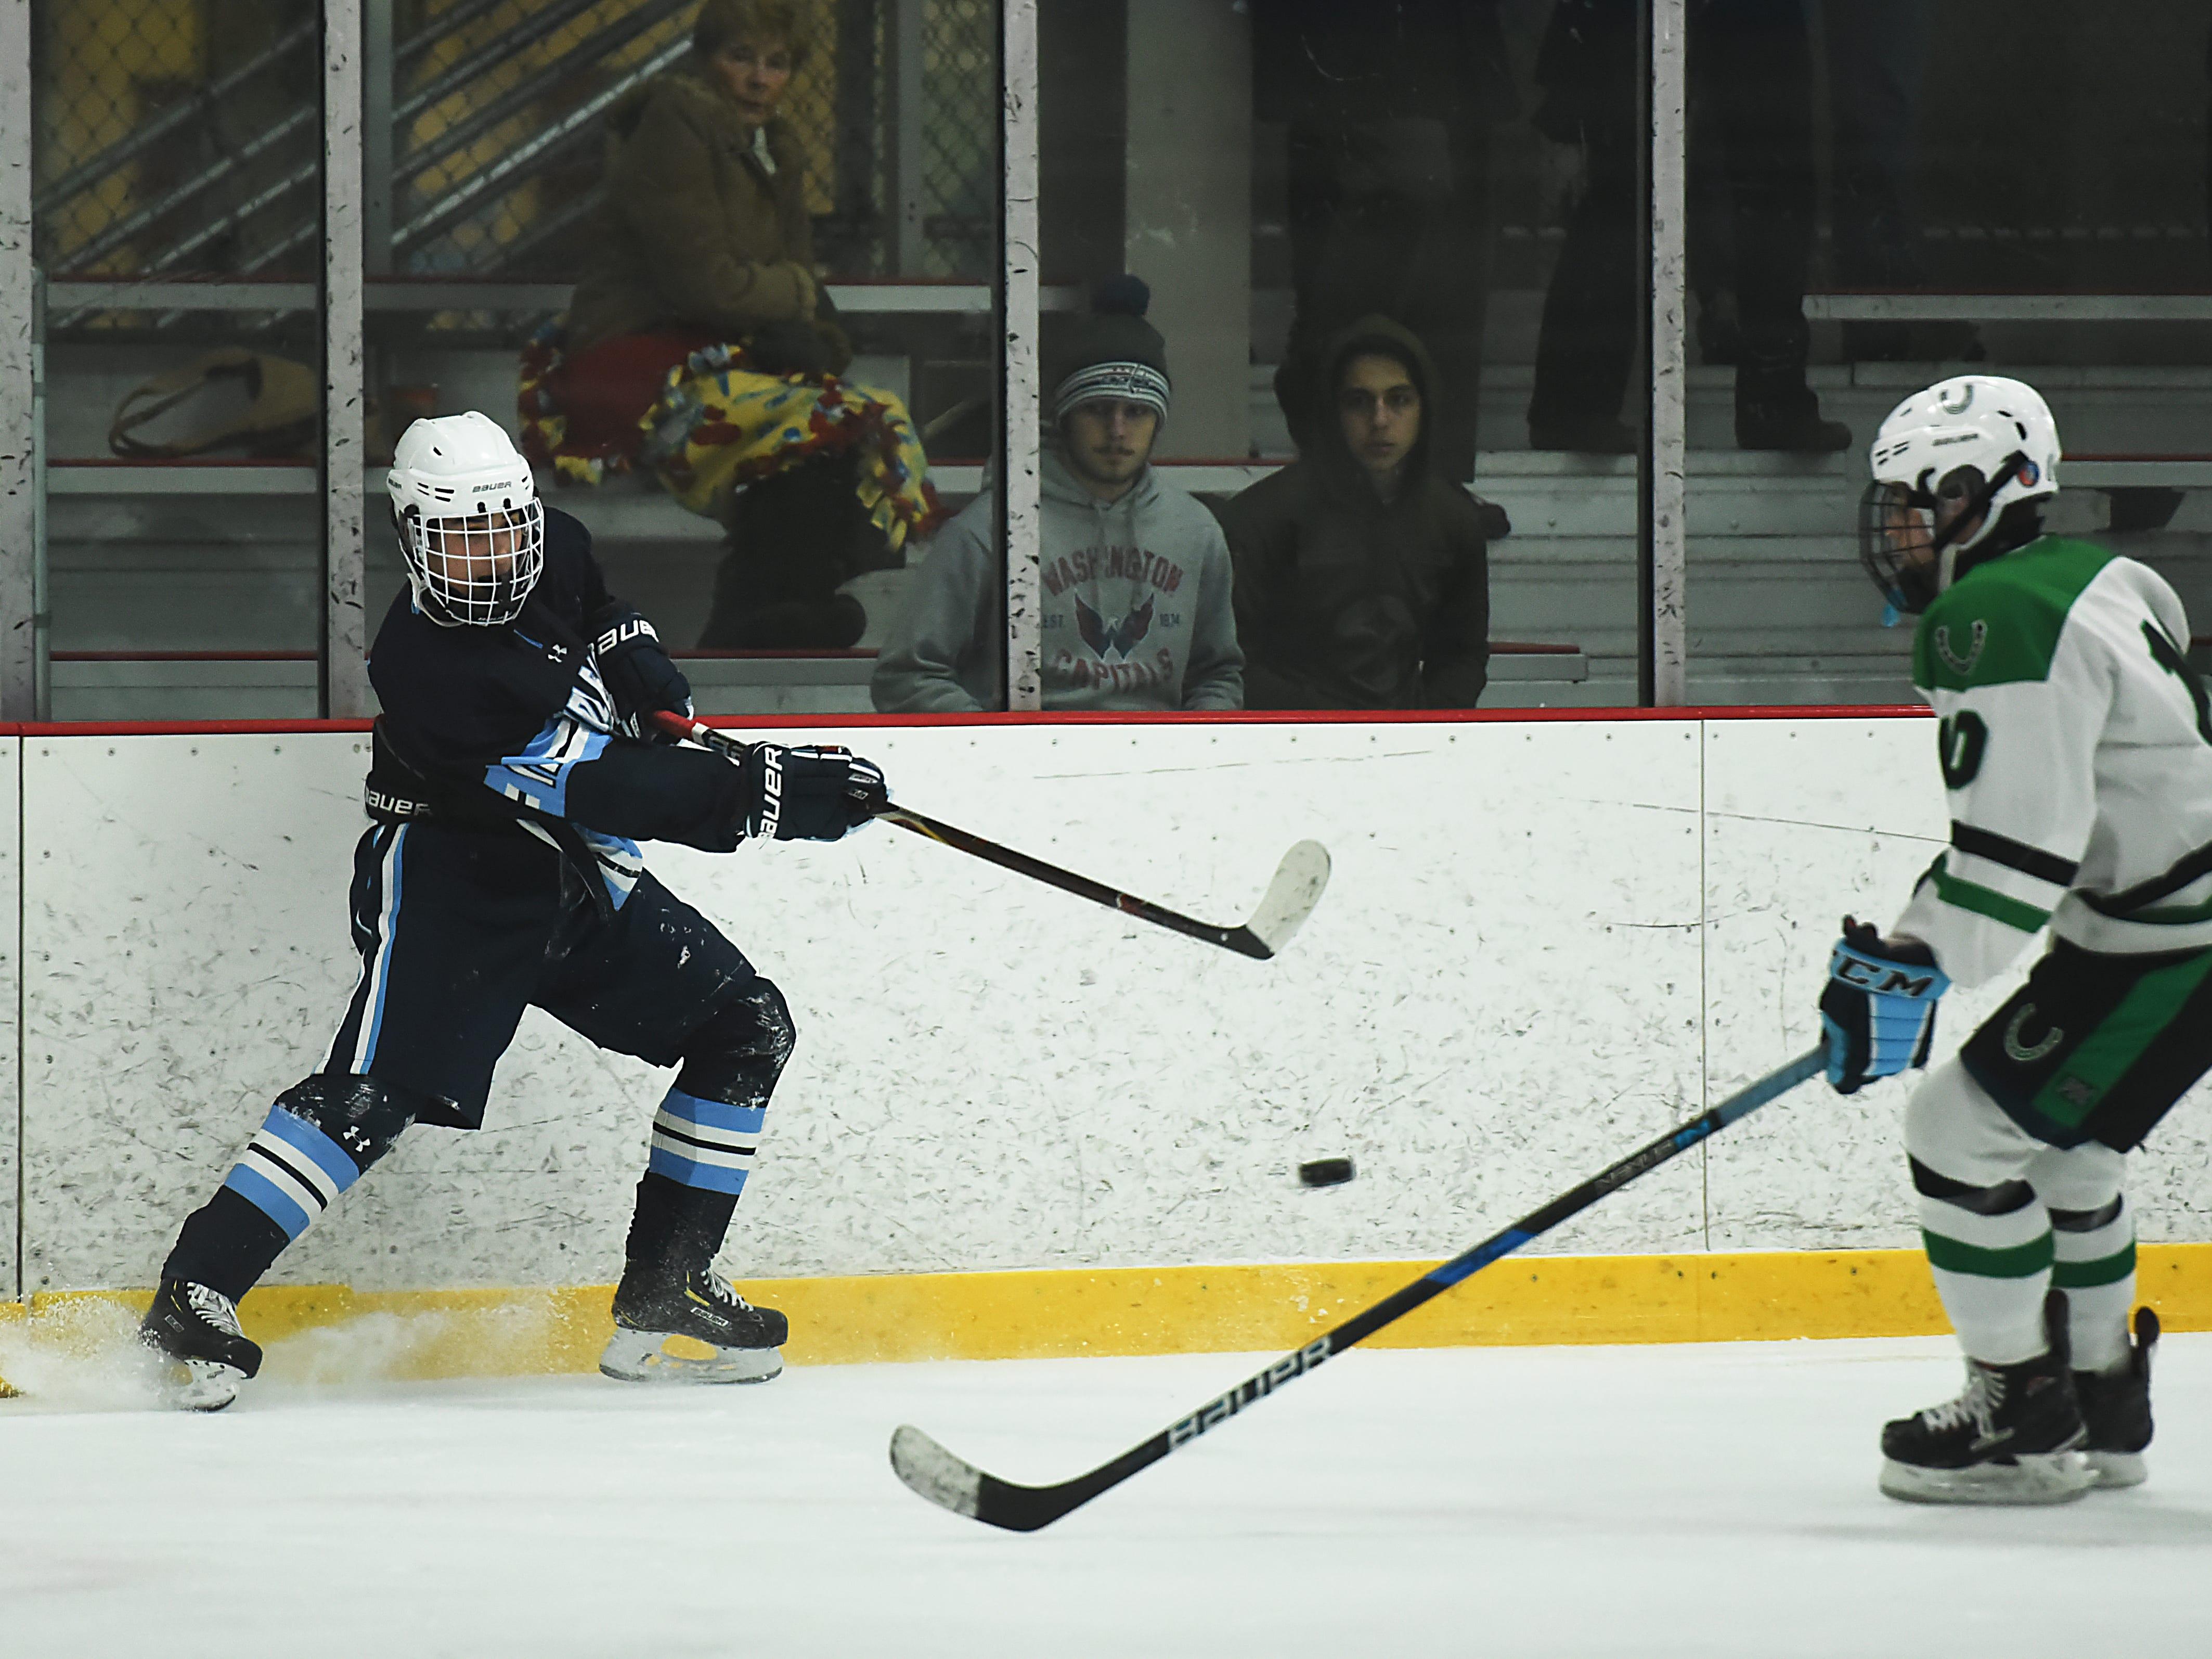 Kinnelon vs. West Morris hockey game at Skylands Ice World in Stockholm on Friday January 11, 2019. (From left) WM#11 Max Michalski and K#10 Evan Granier.